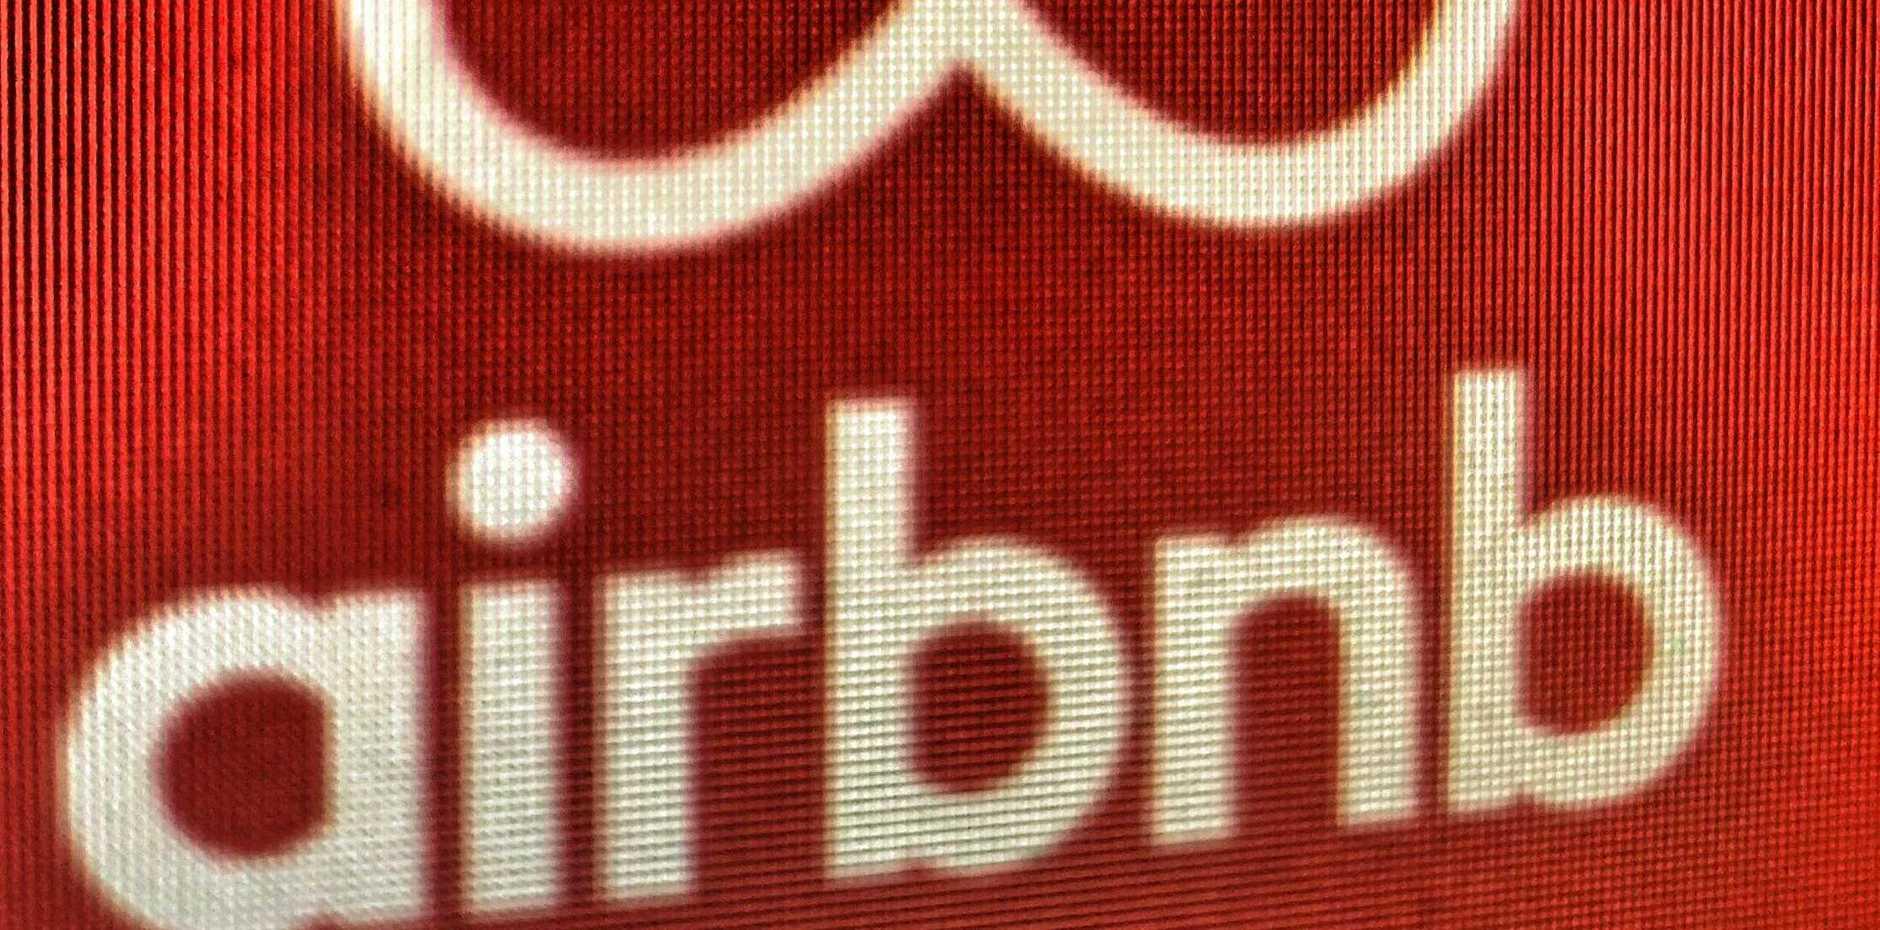 SHARING ECONOMY: AirBnB logo